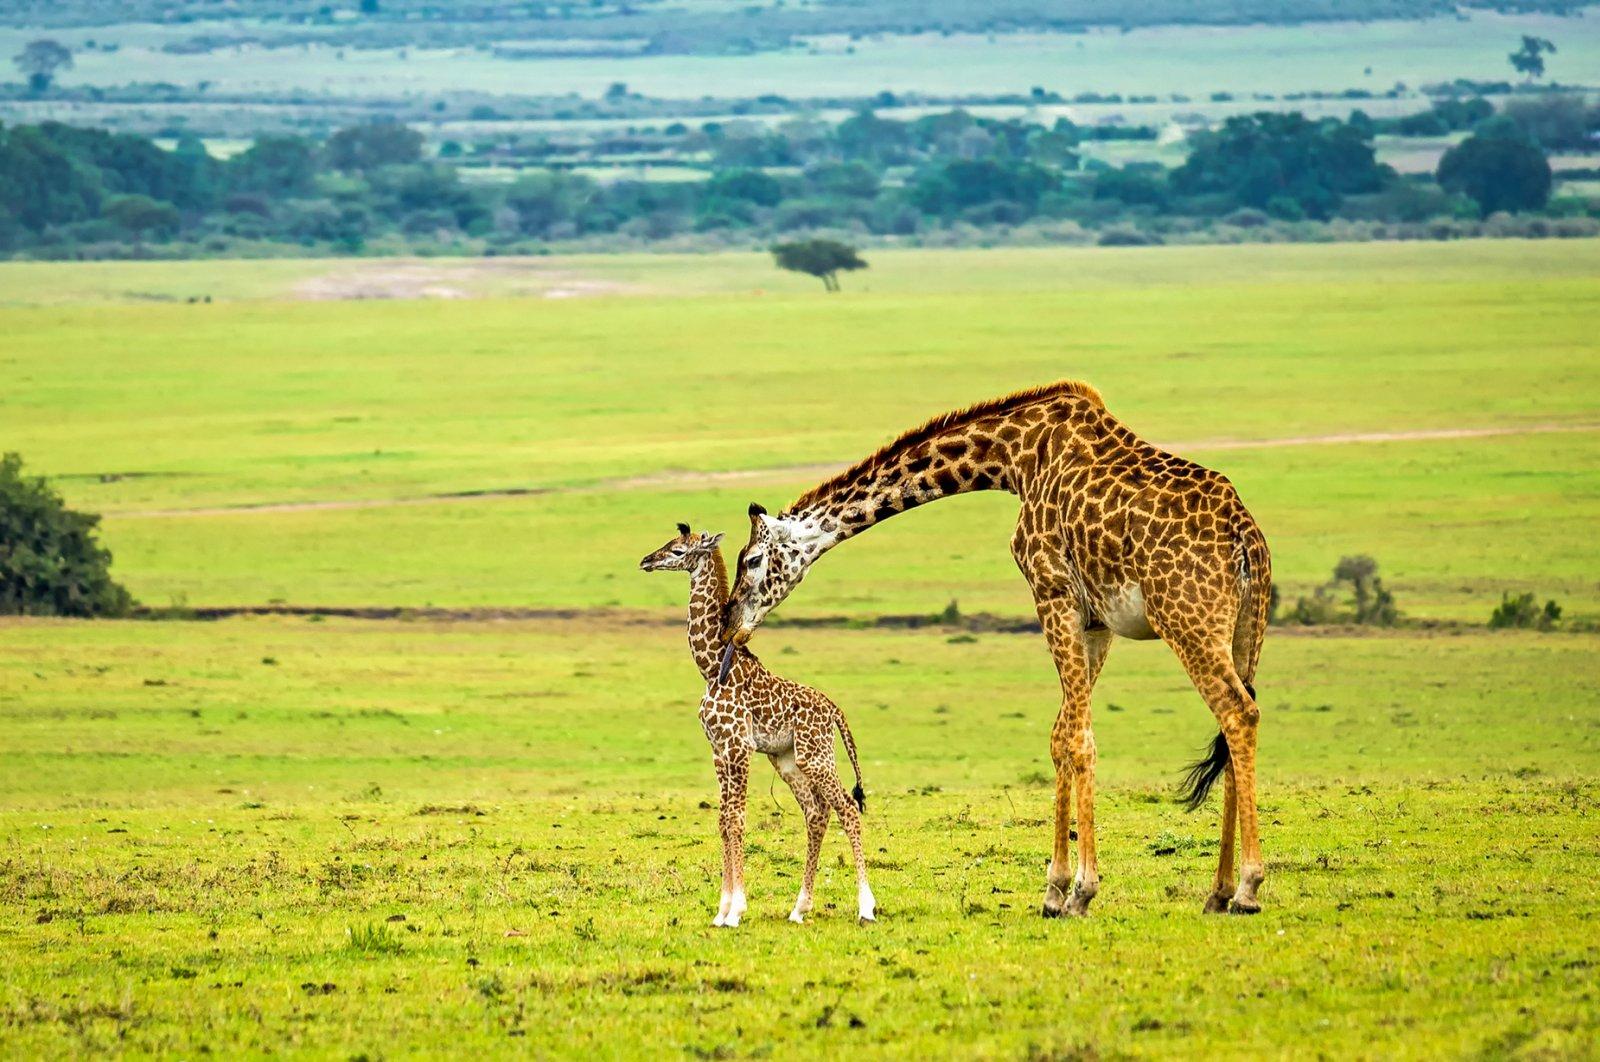 A mother giraffe cleans the back of her baby,Maasai Mara National Reserve, Kenya. (Shutterstock Photo)